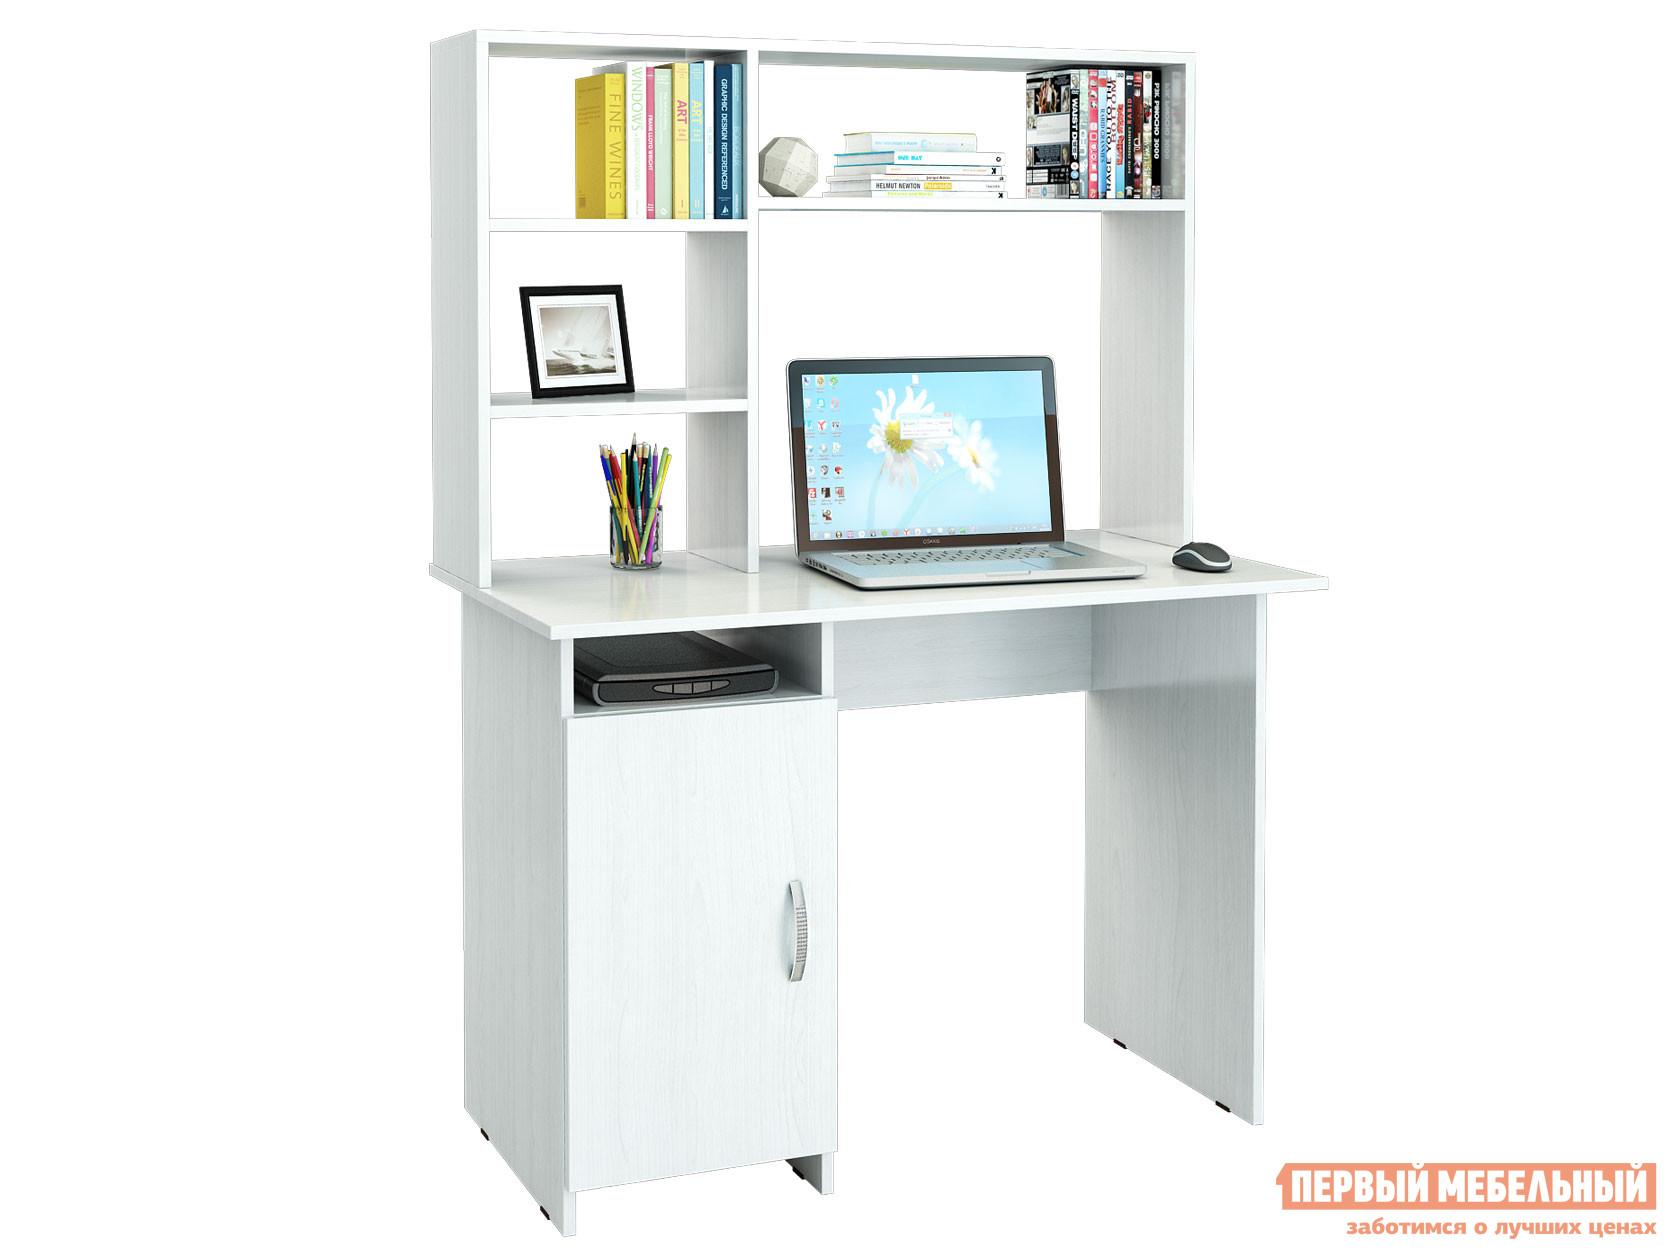 Компьютерный стол МФ Мастер Милан-8 с надстройкой угловой компьютерный стол с надстройкой васко кс 20 29 м1